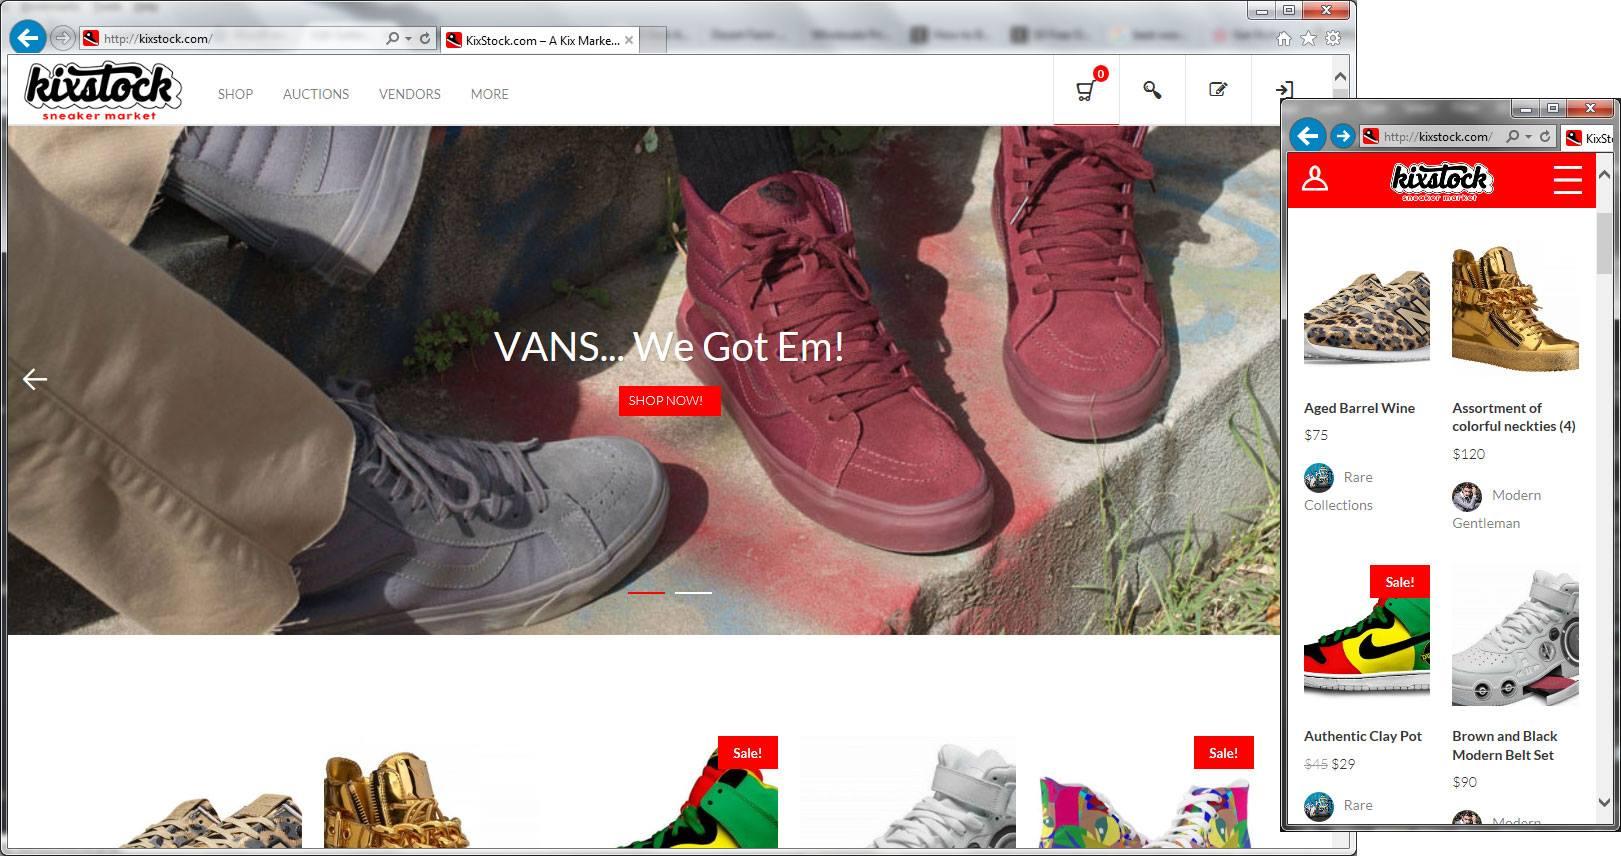 website-design-services-oc44.jpg